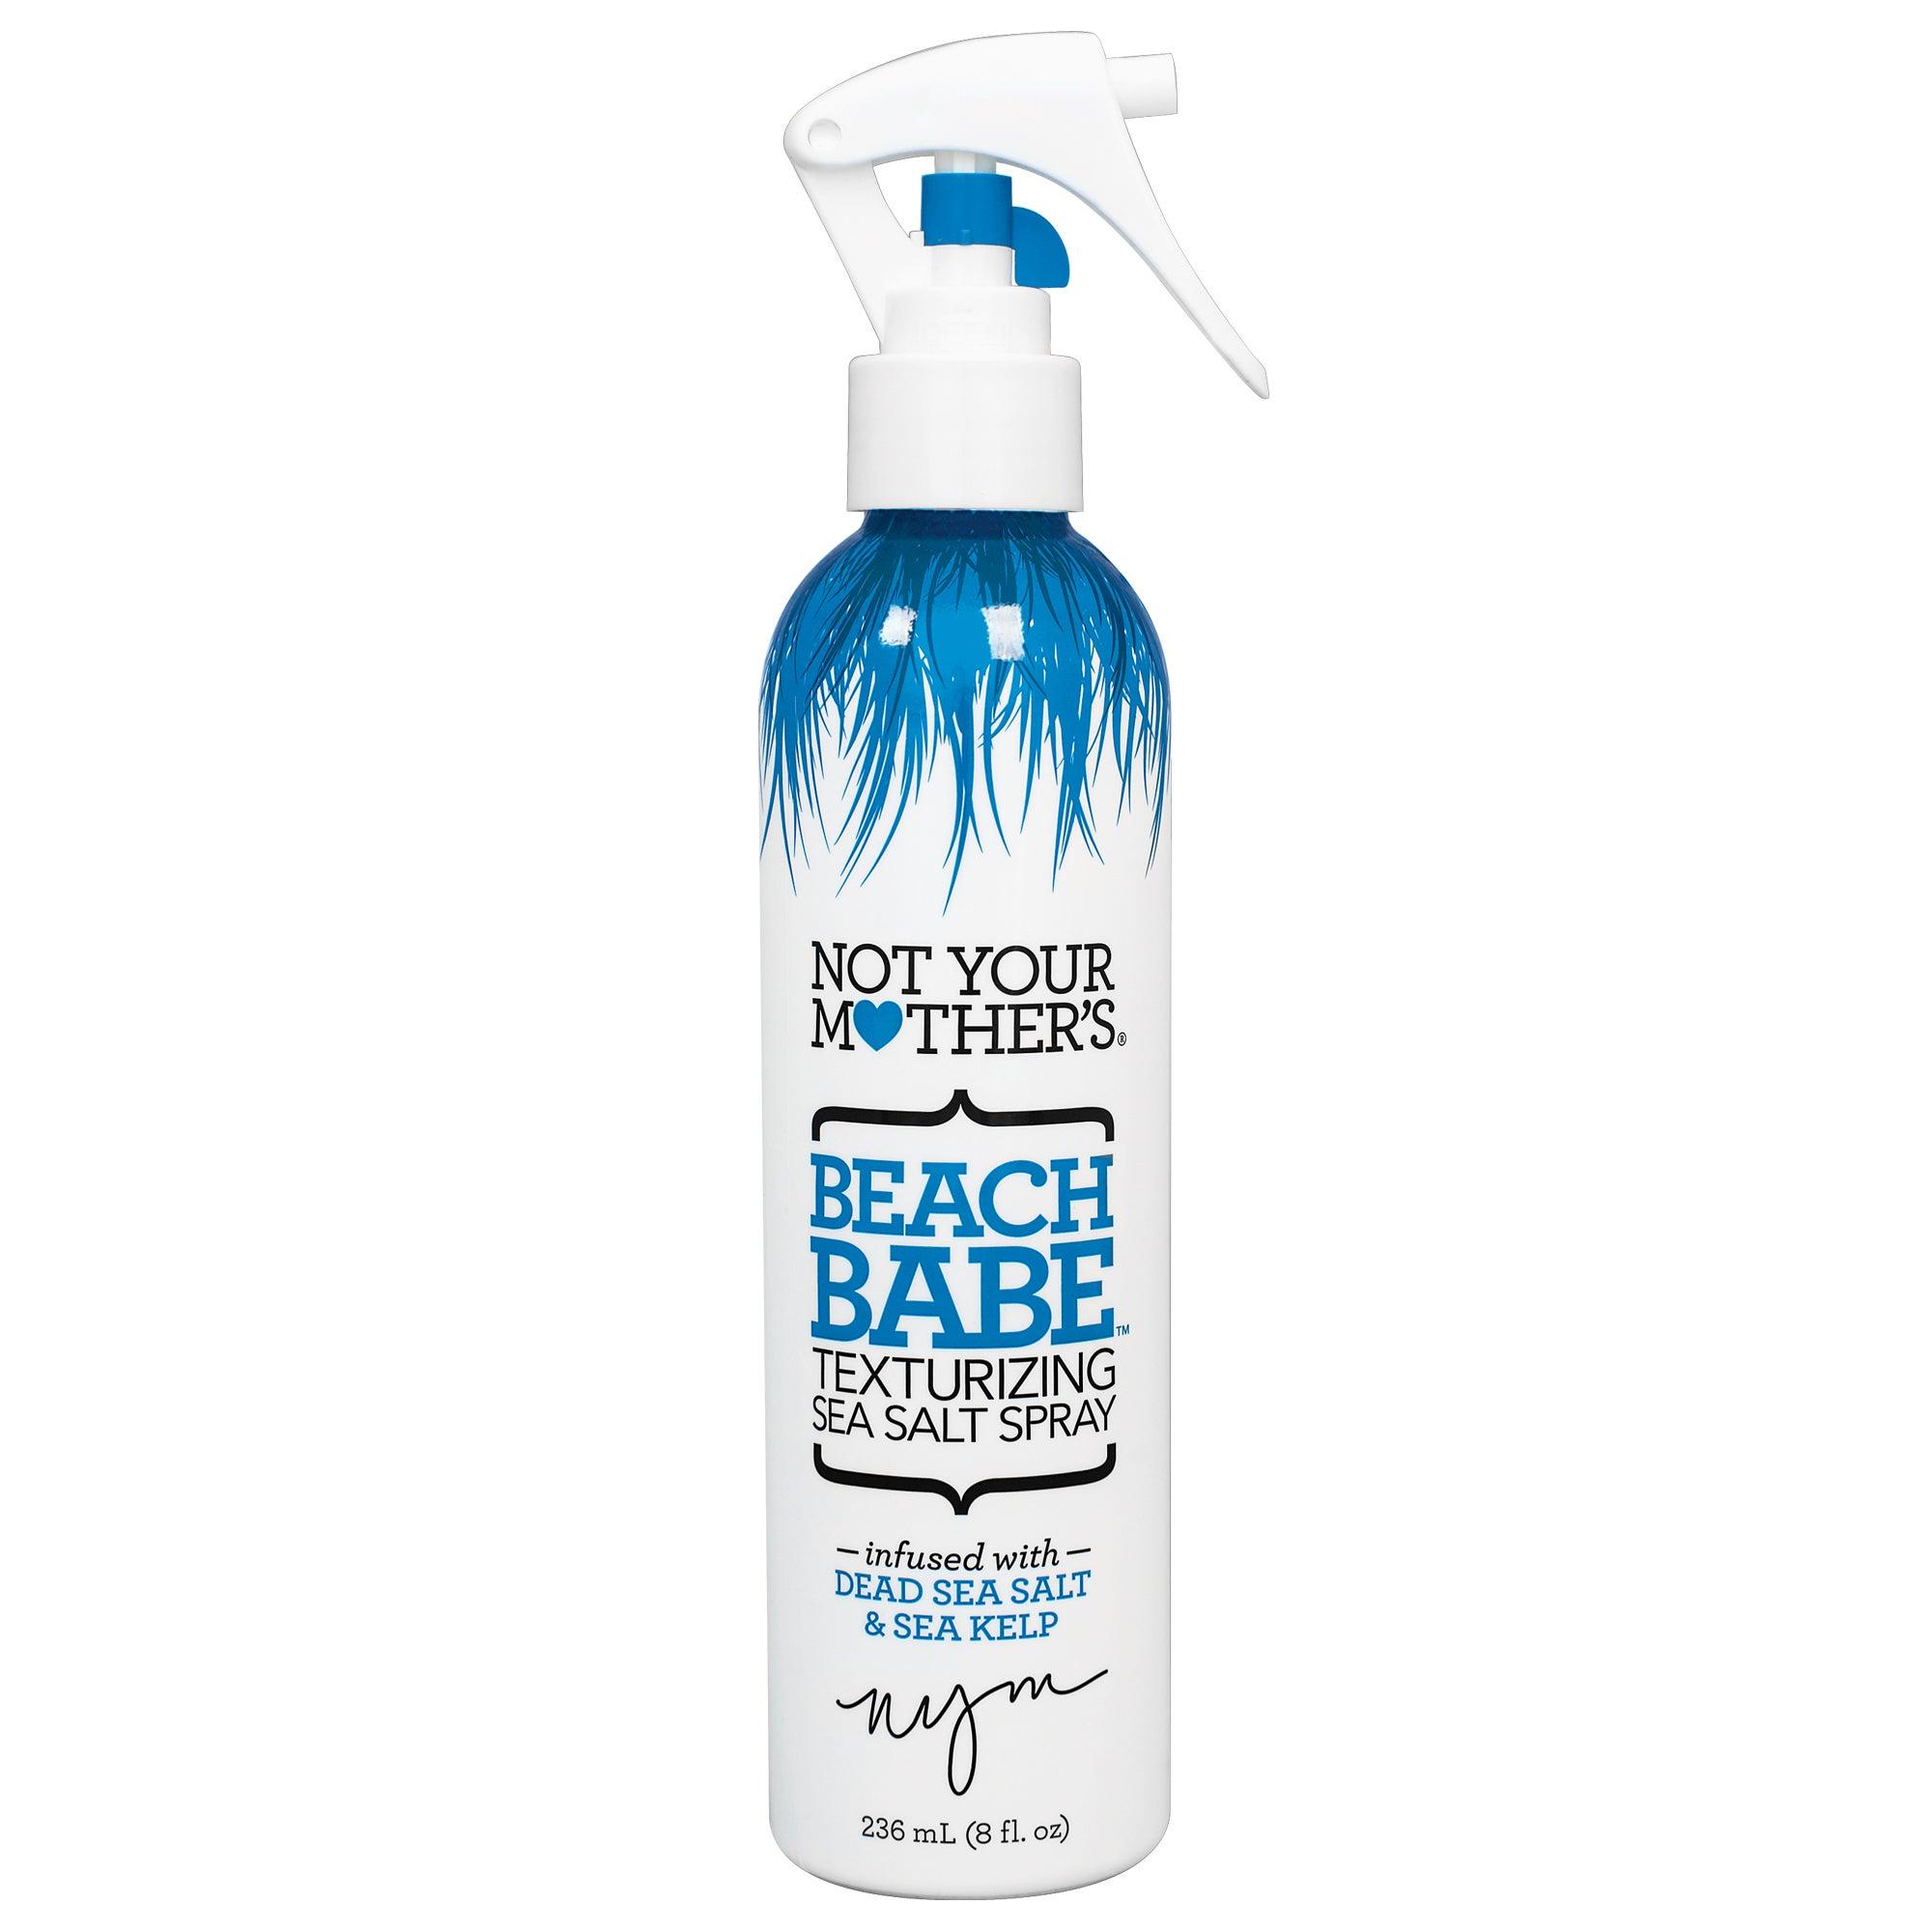 Not Your Mothers Beach Babe Texturizing Sea Salt Spray